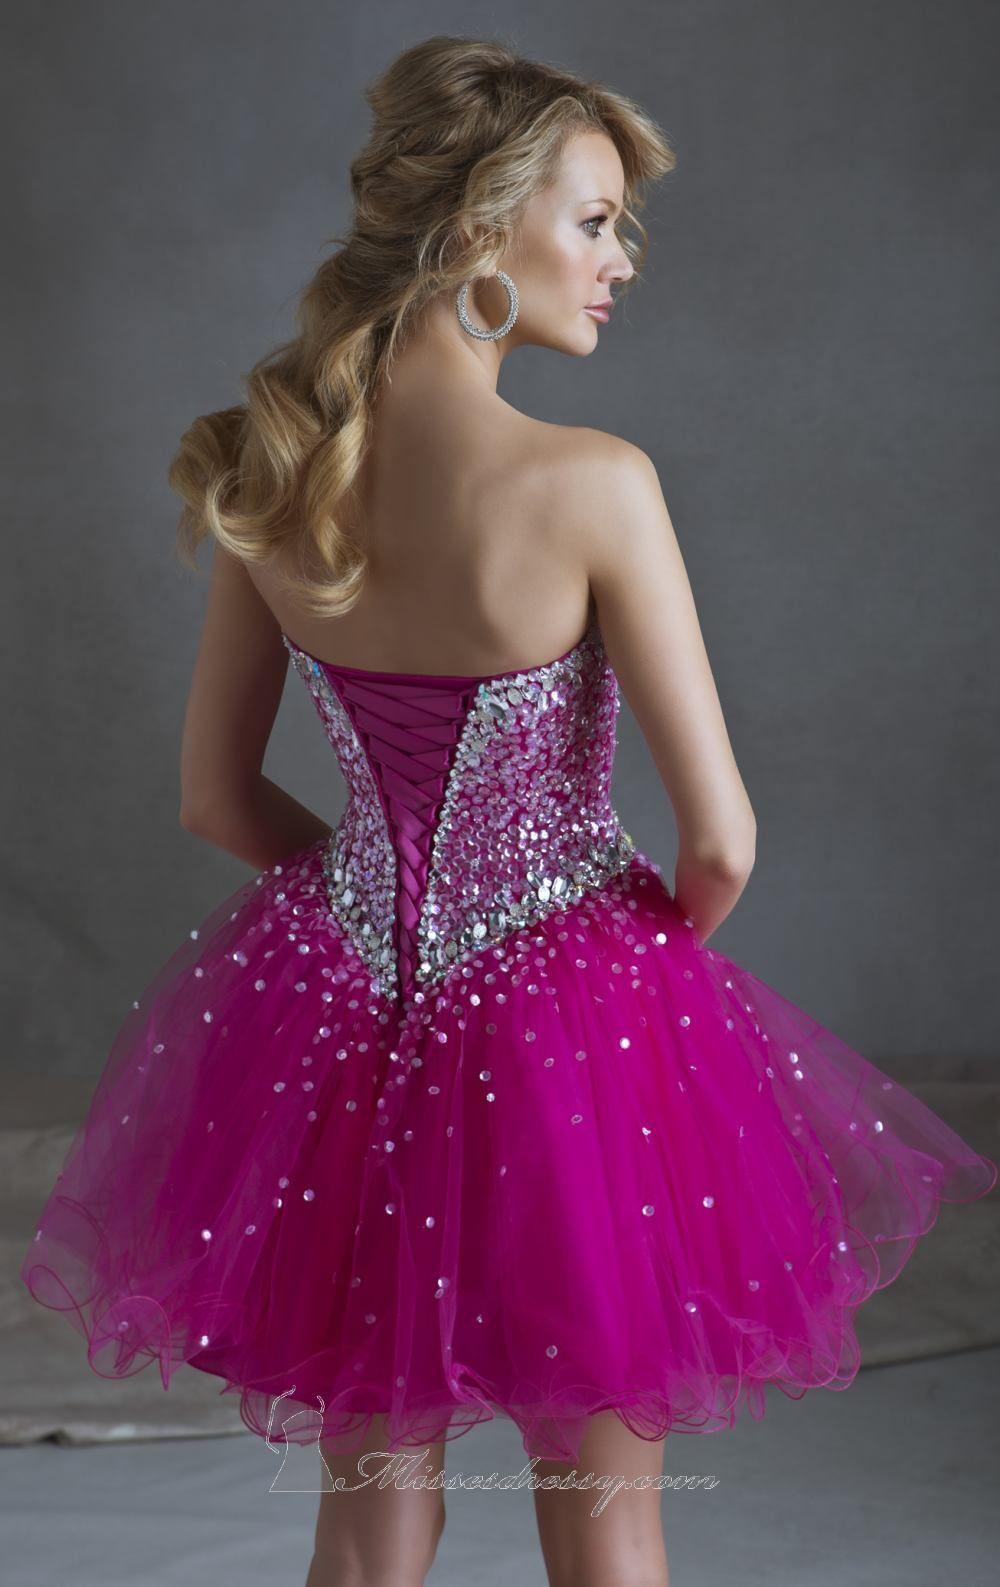 Mori Lee 9238 Dress - MissesDressy.com   STICKS & STONES   Pinterest